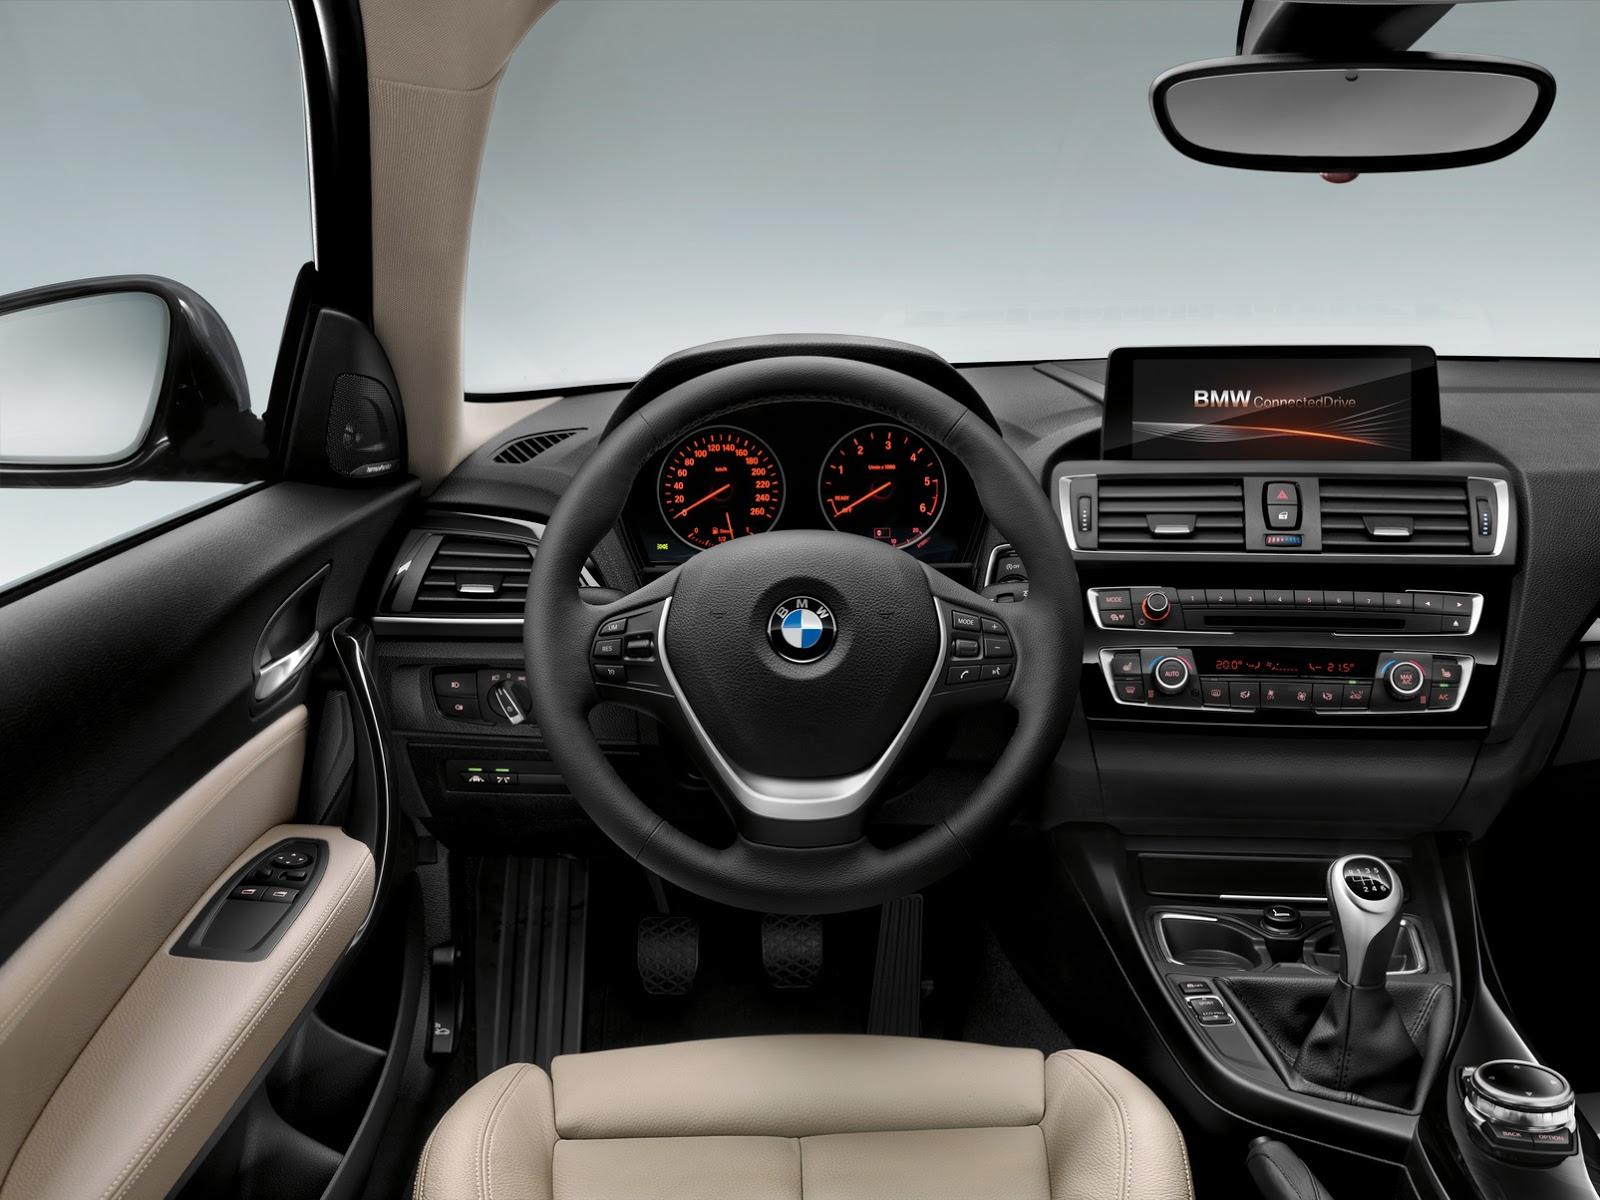 BMW Seria 1 facelift 2015 - floteauto 3